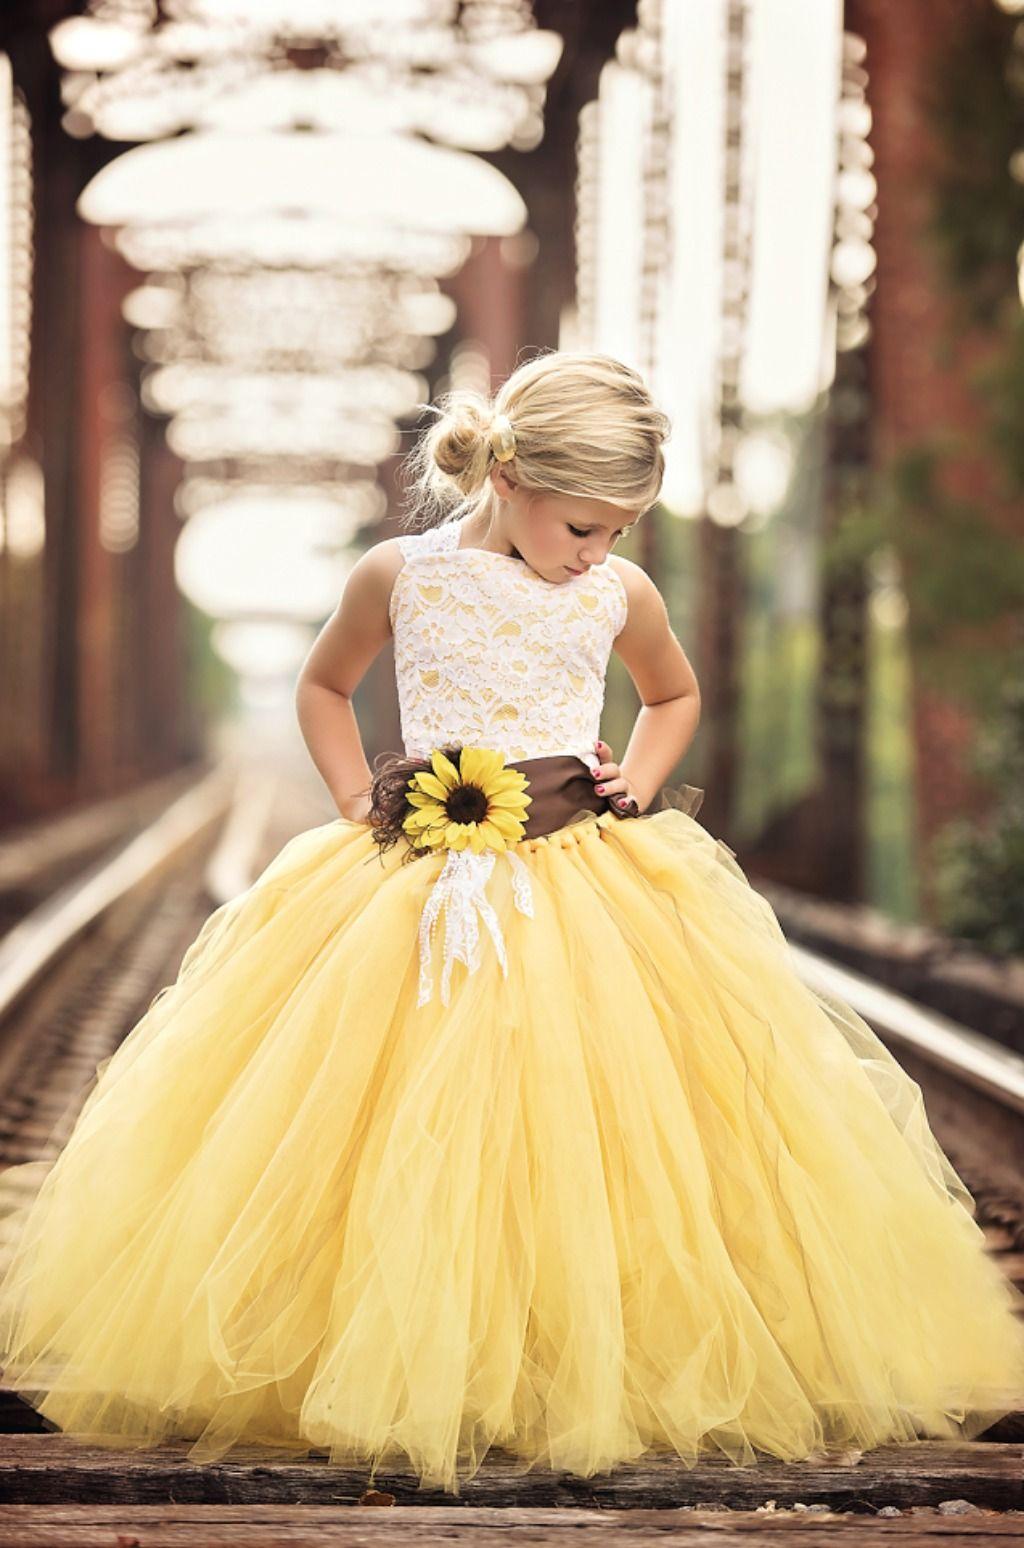 Vendor Inspiration 19973 Sunflower Themed Wedding Plum Bridesmaid Dresses Country Wedding Dresses [ 1548 x 1024 Pixel ]